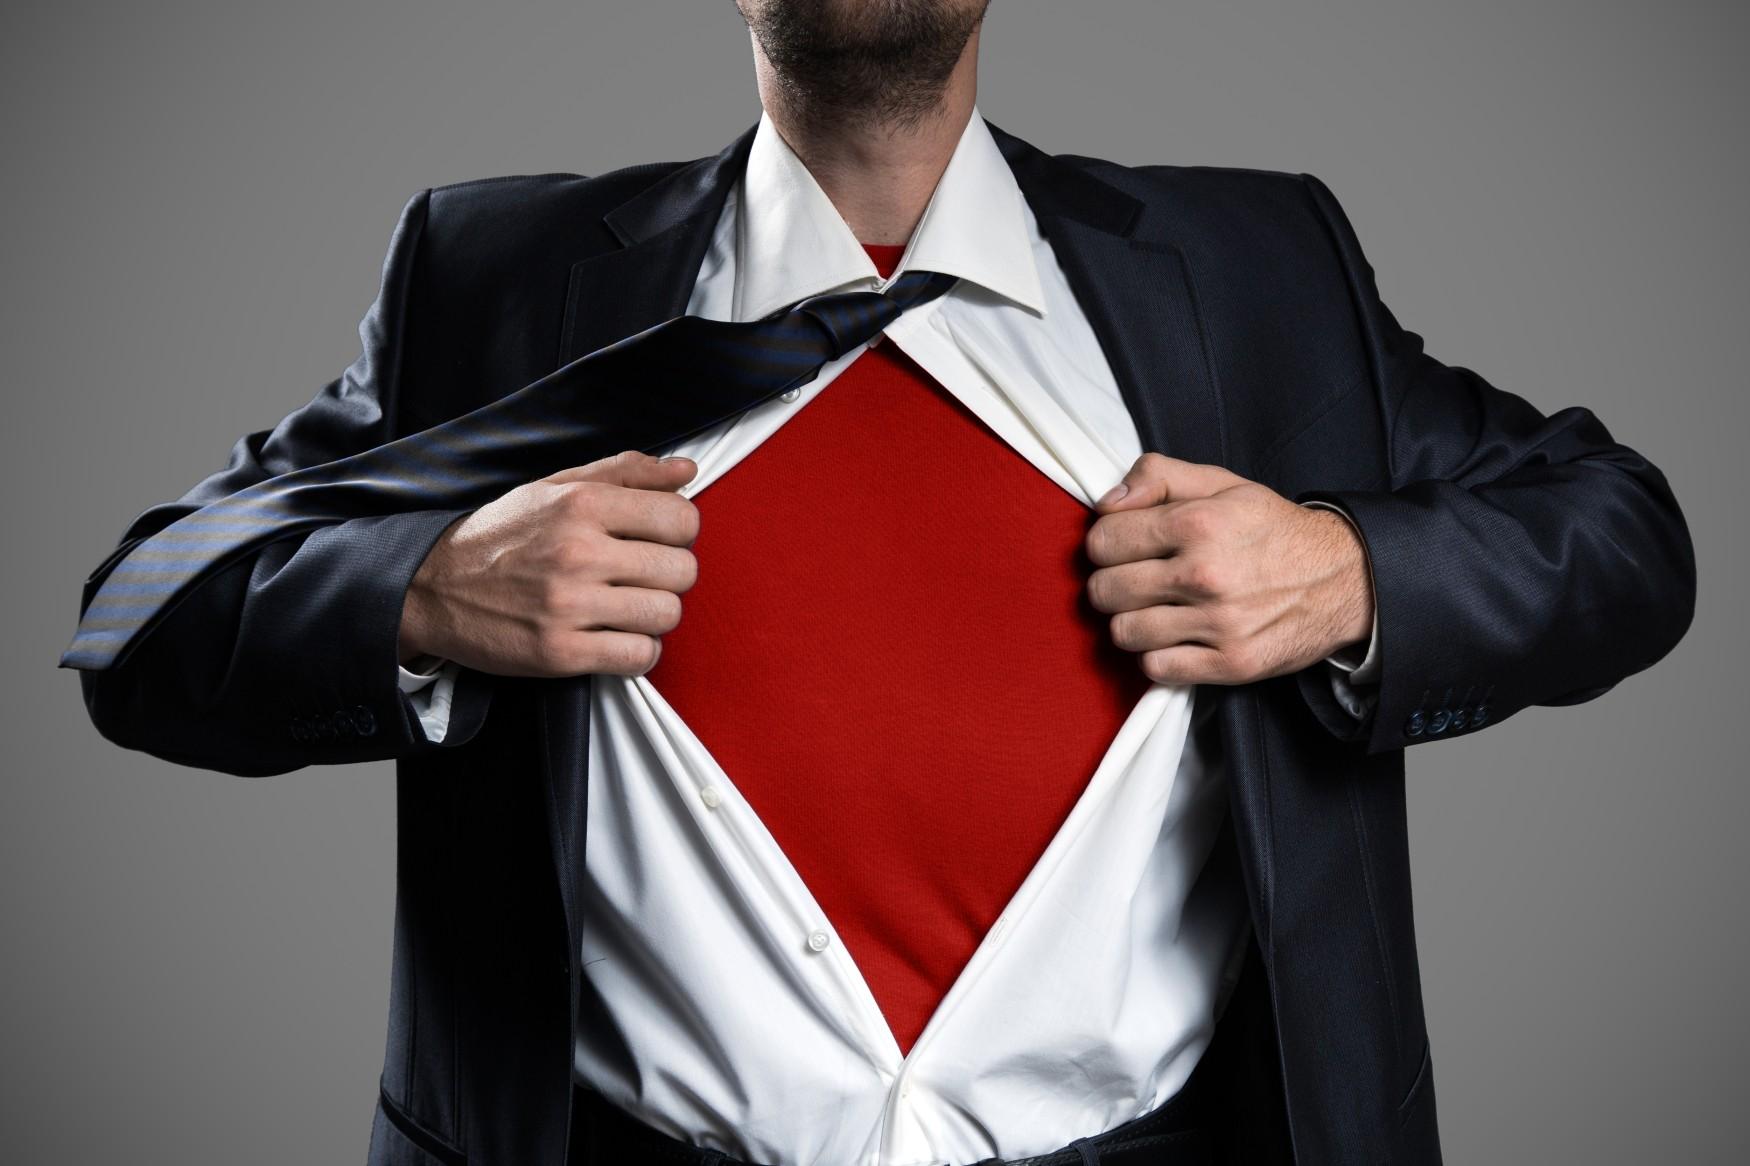 act like a superhero